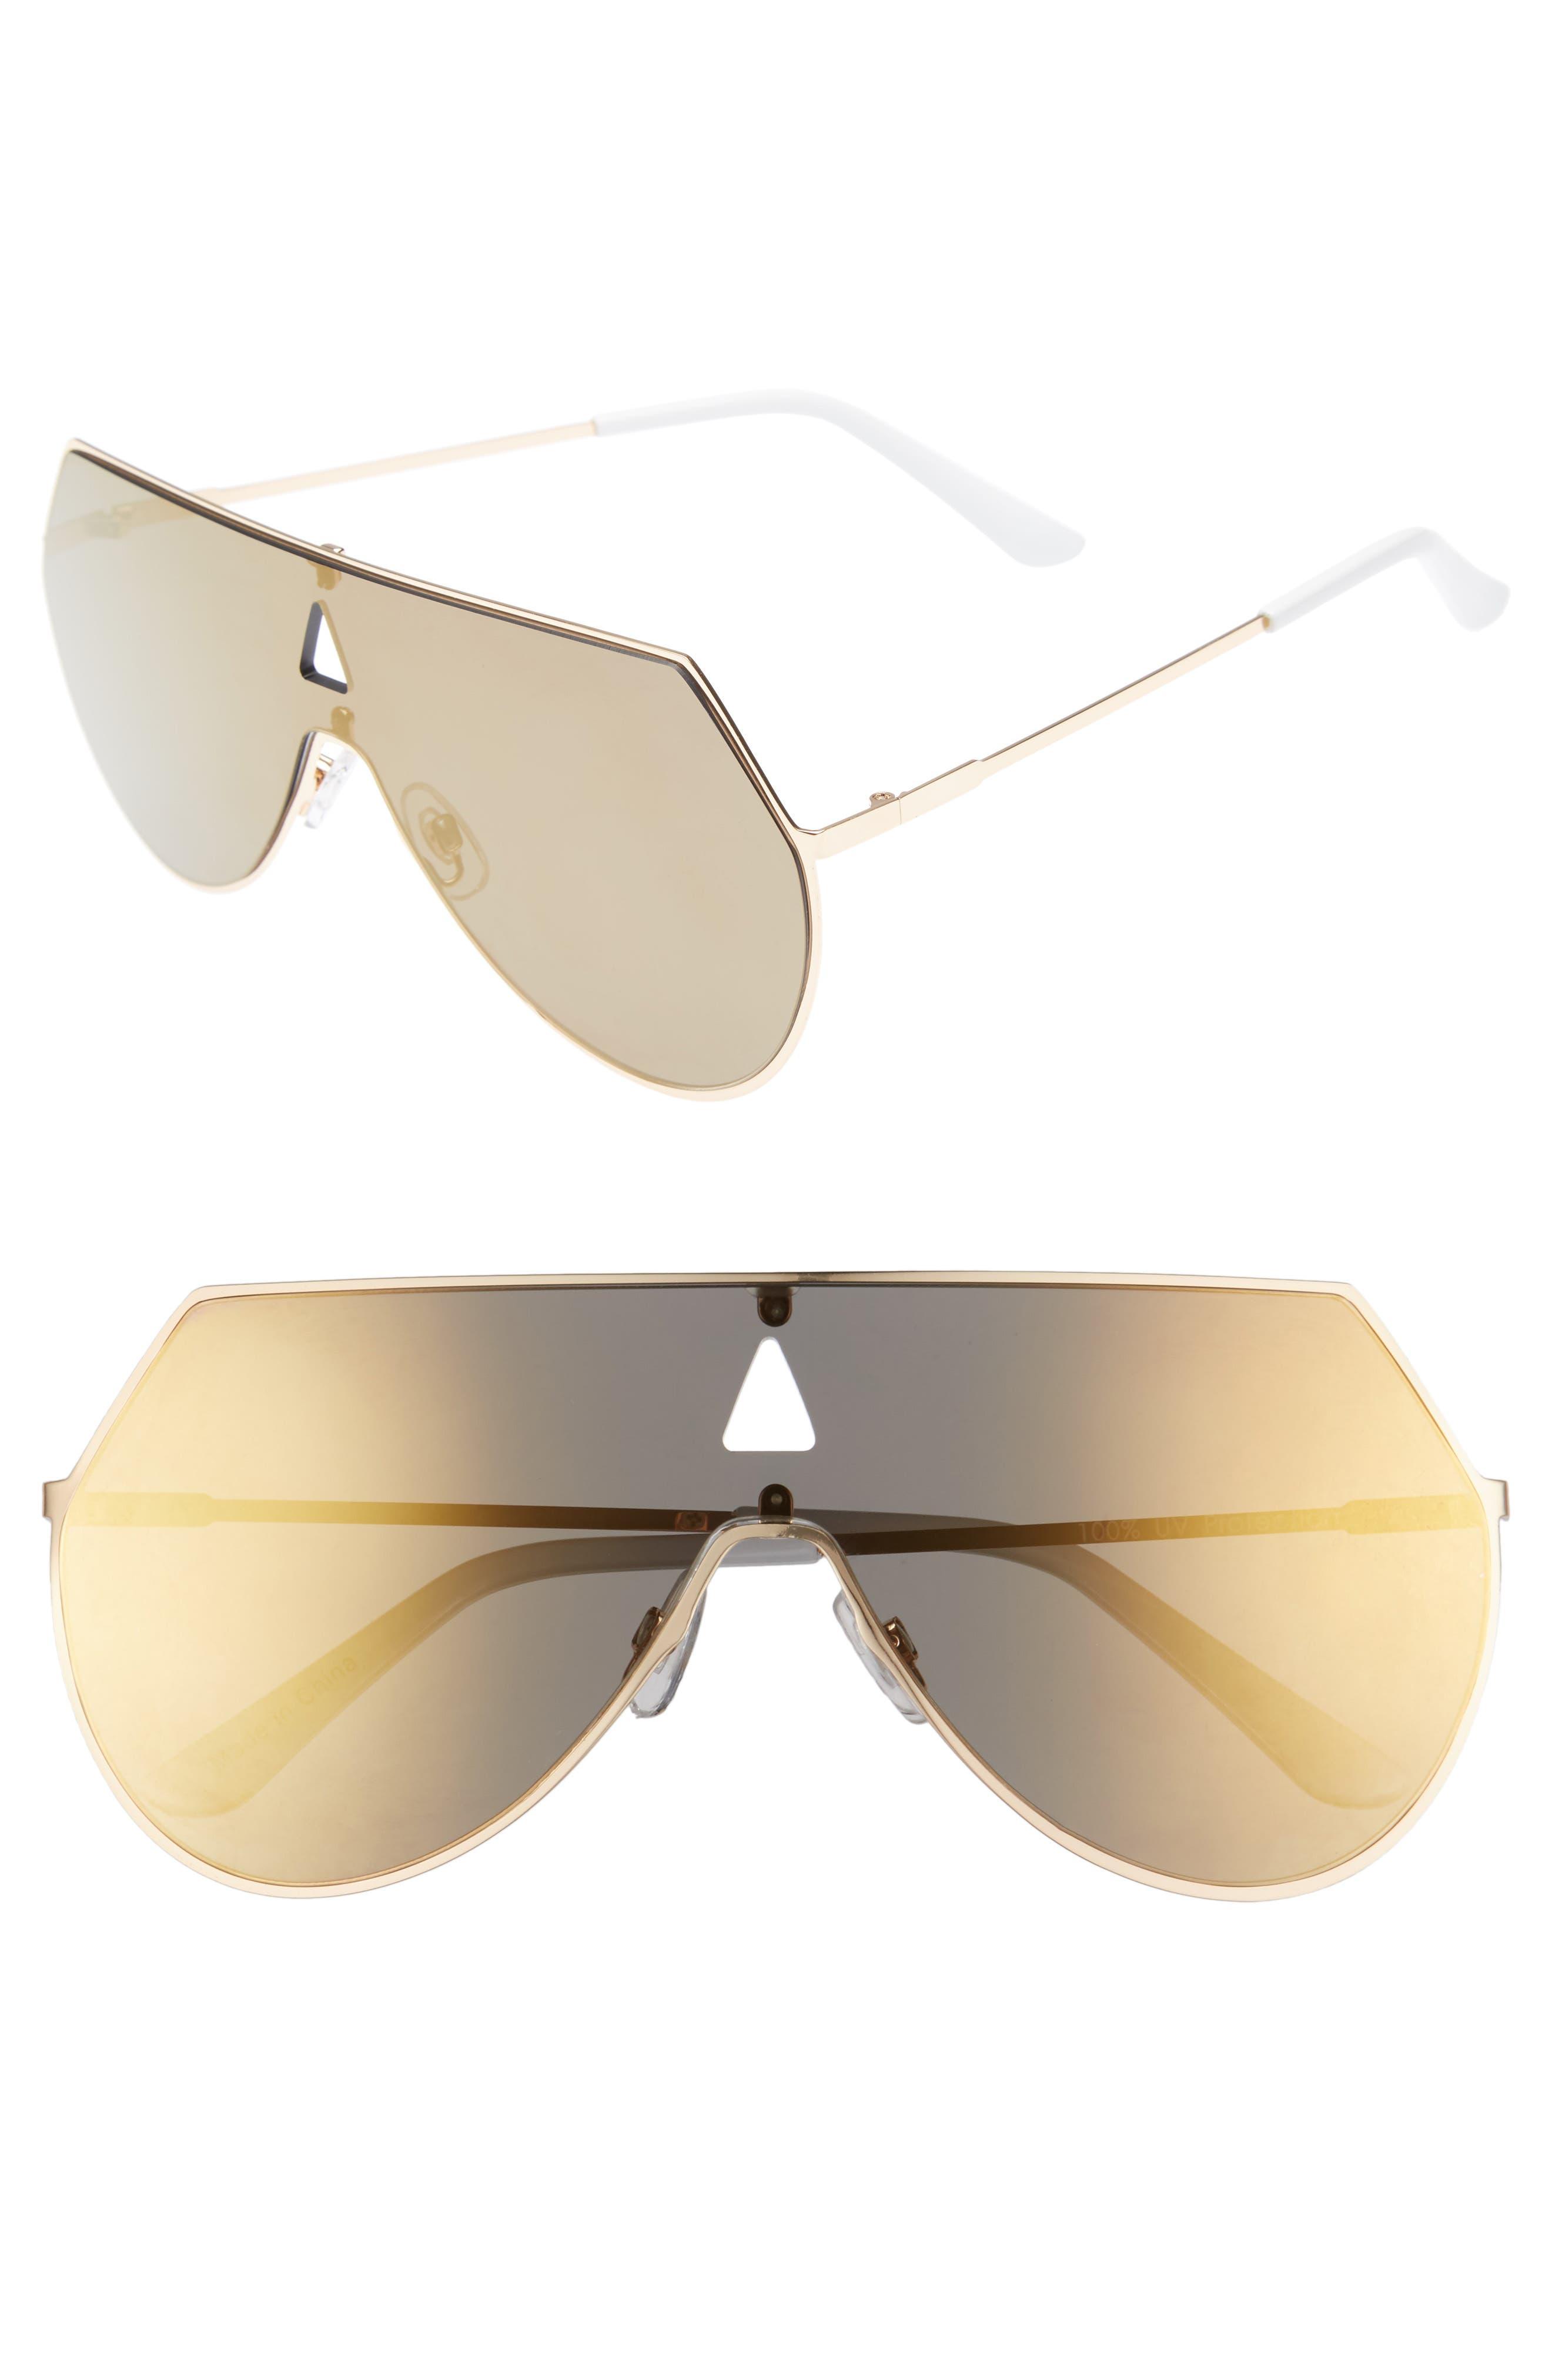 Main Image - BP. 60mm Flat Lens Aviator Sunglasses